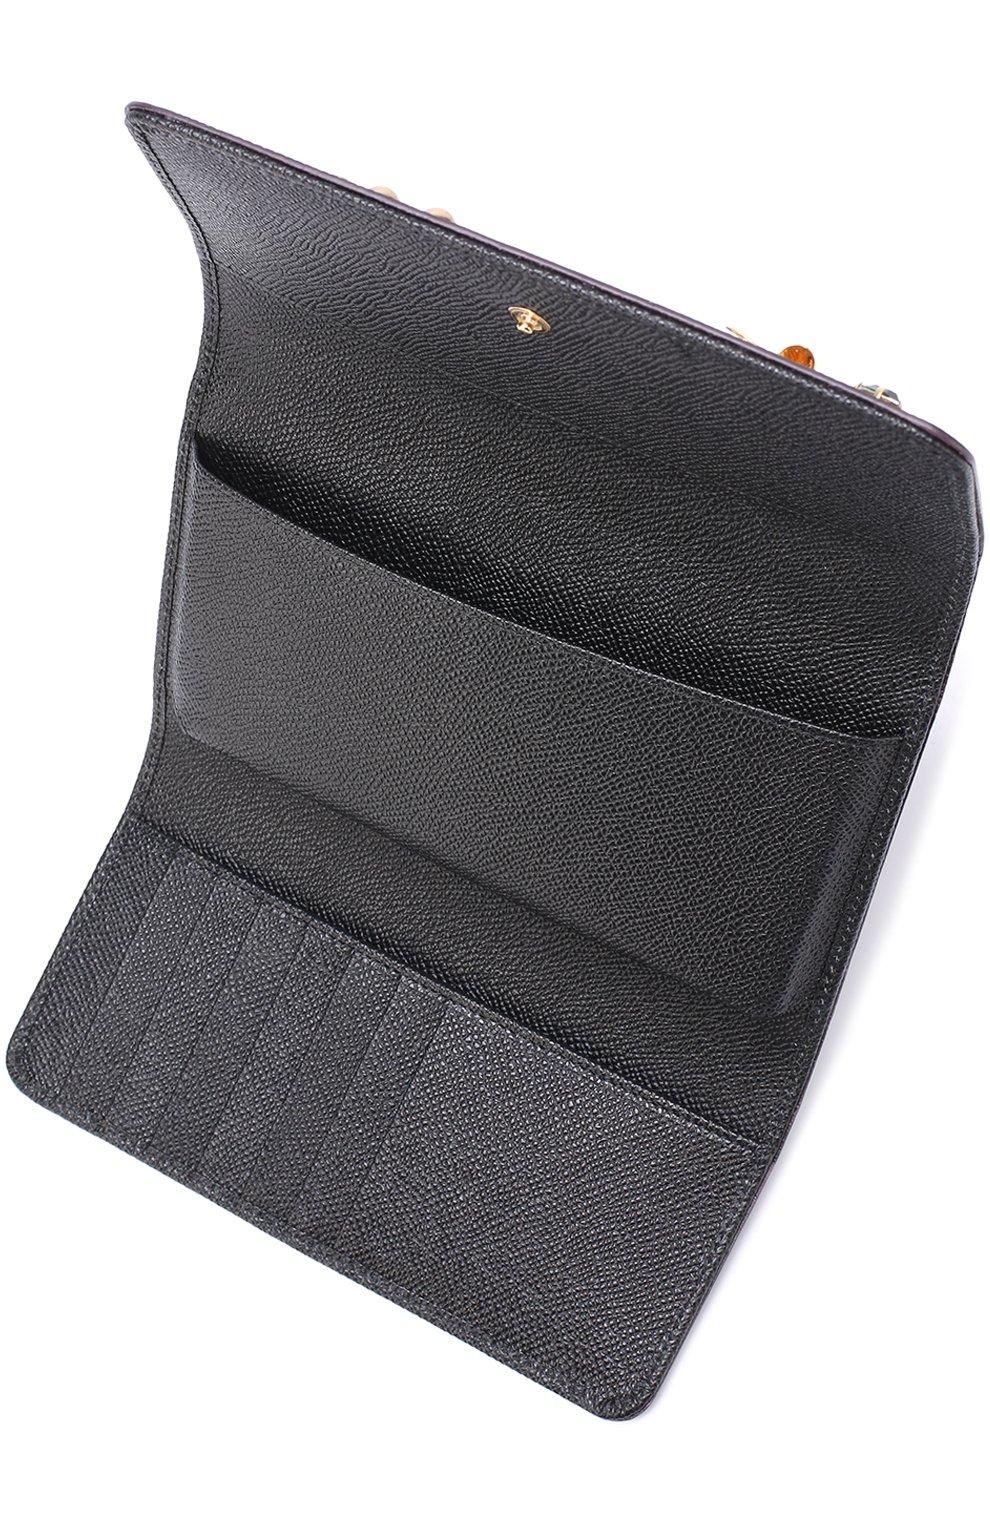 Кожаный чехол для iPhone 7 Plus на цепочке Dolce & Gabbana  | Фото №3